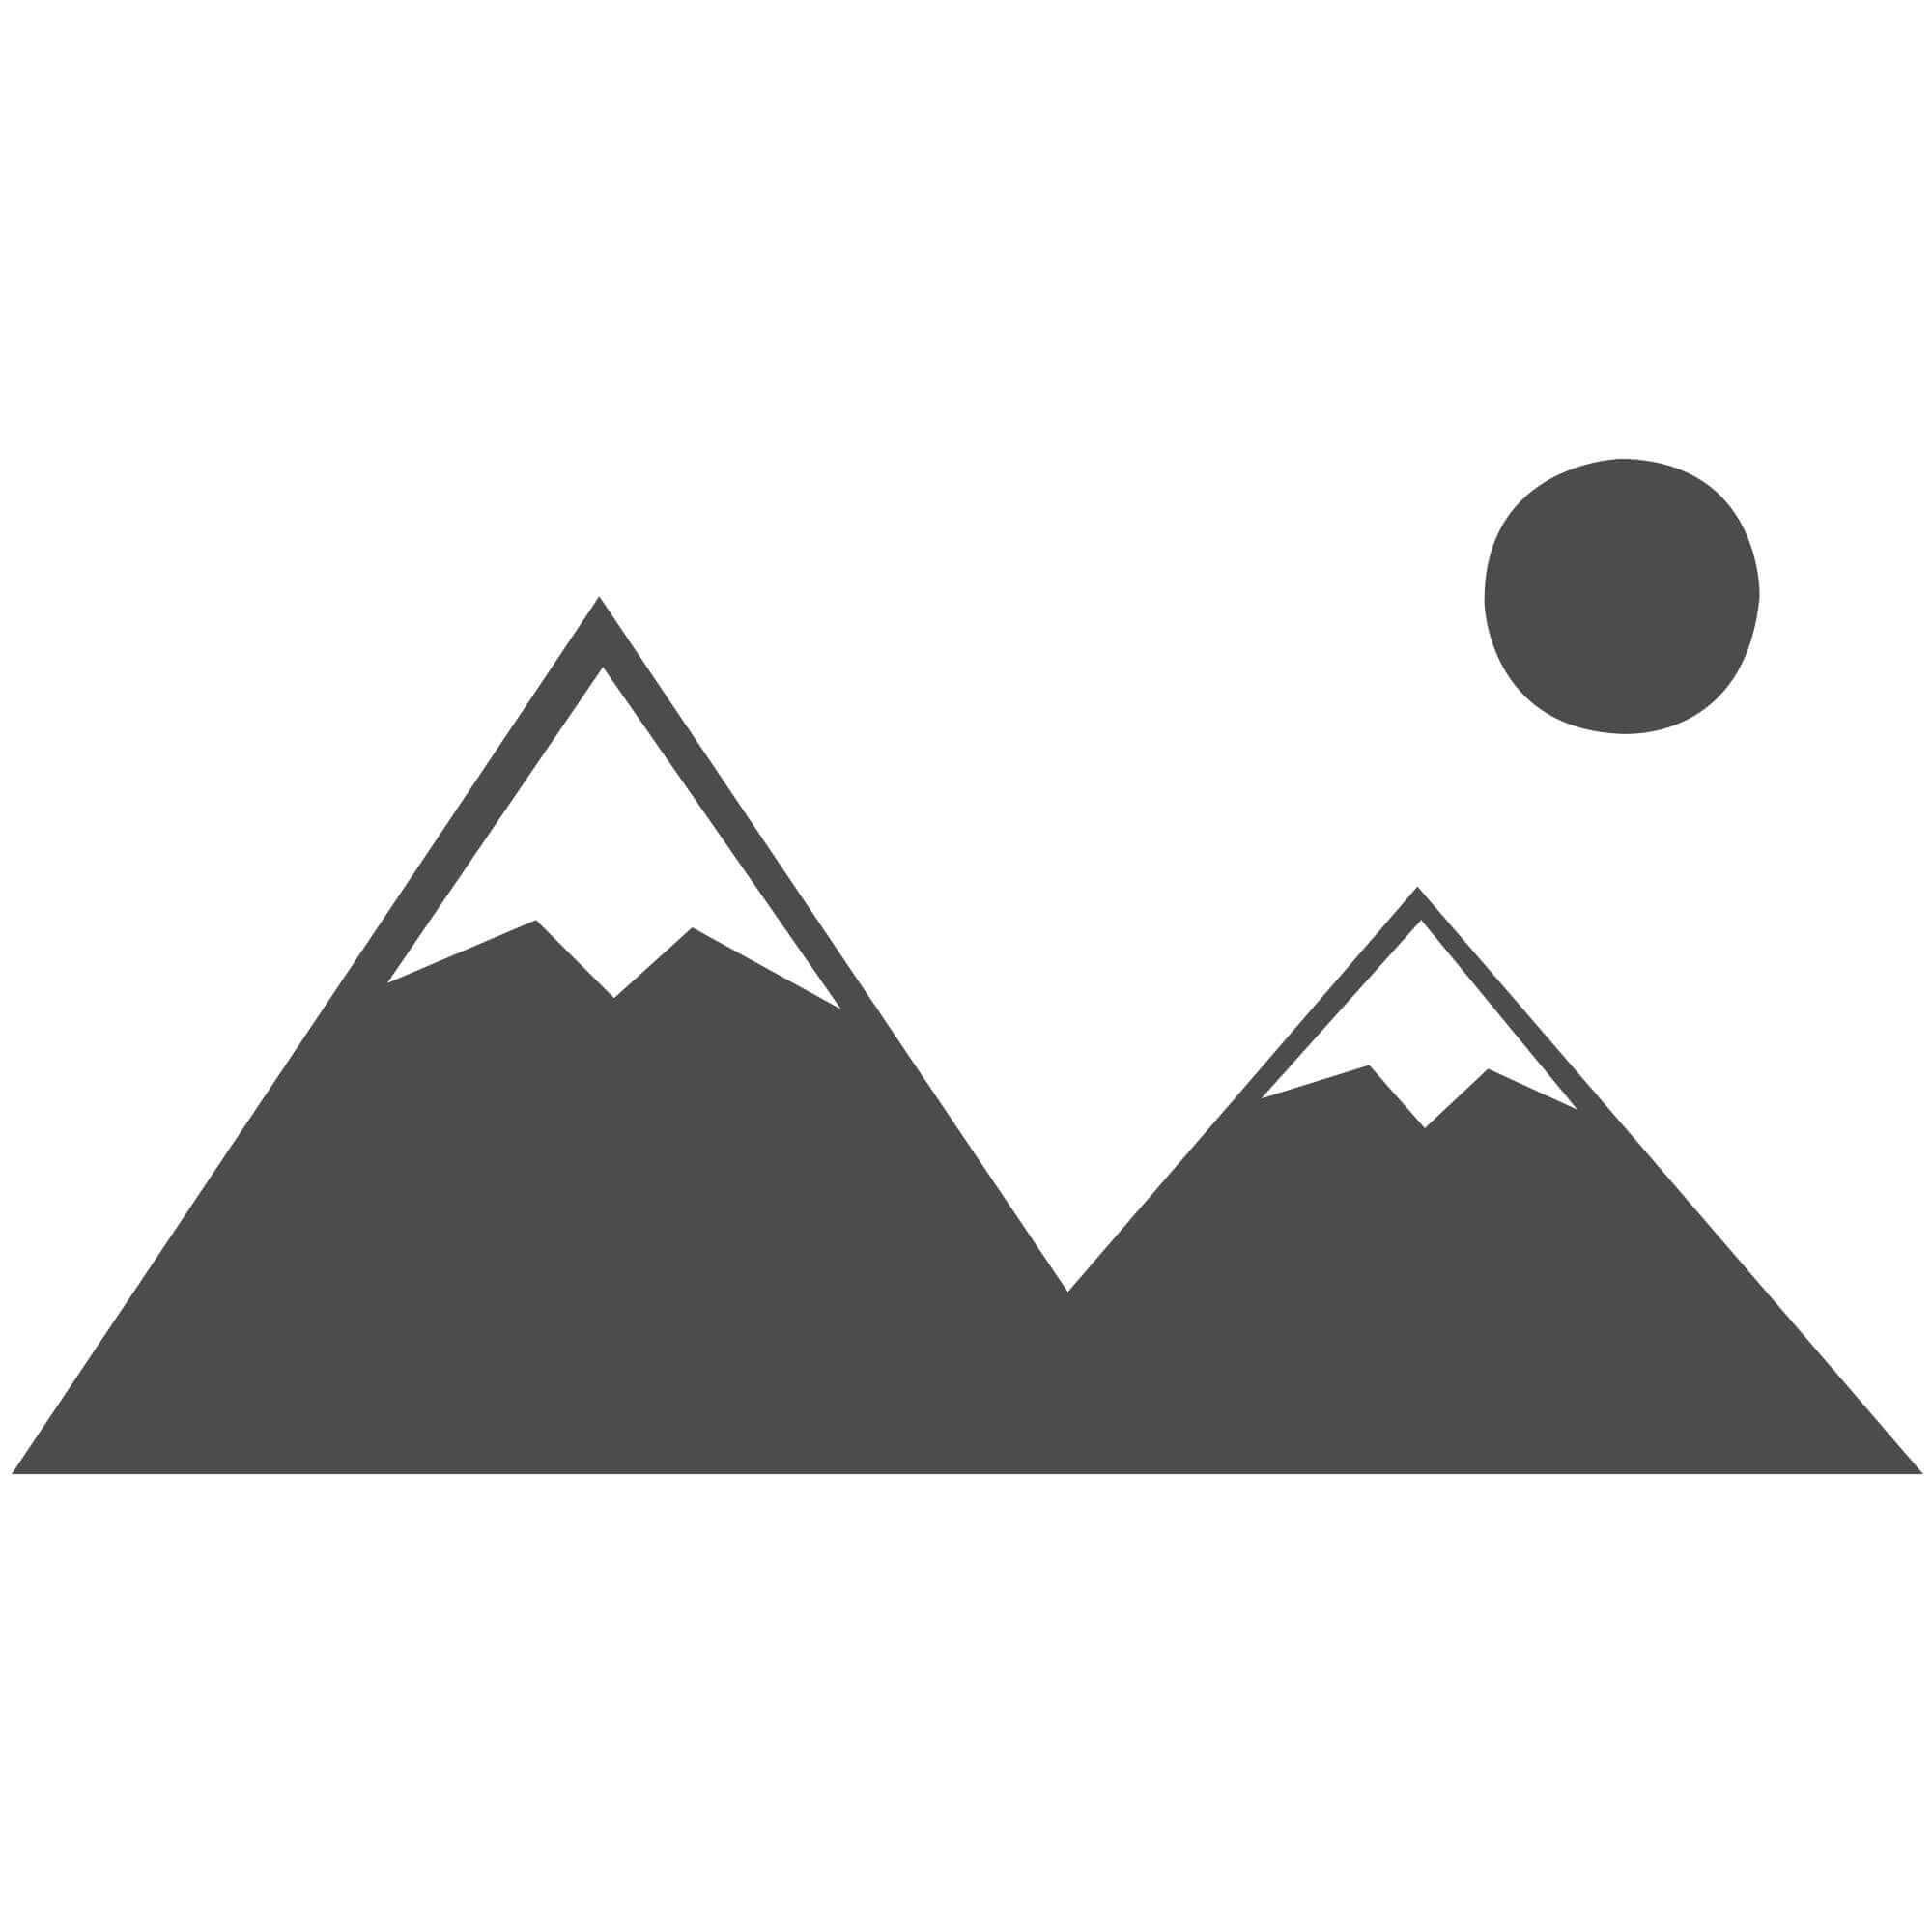 "Cascade Shaggy Rug - Powder White - Size 160 x 230 cm (5'3"" x 7'7"")"